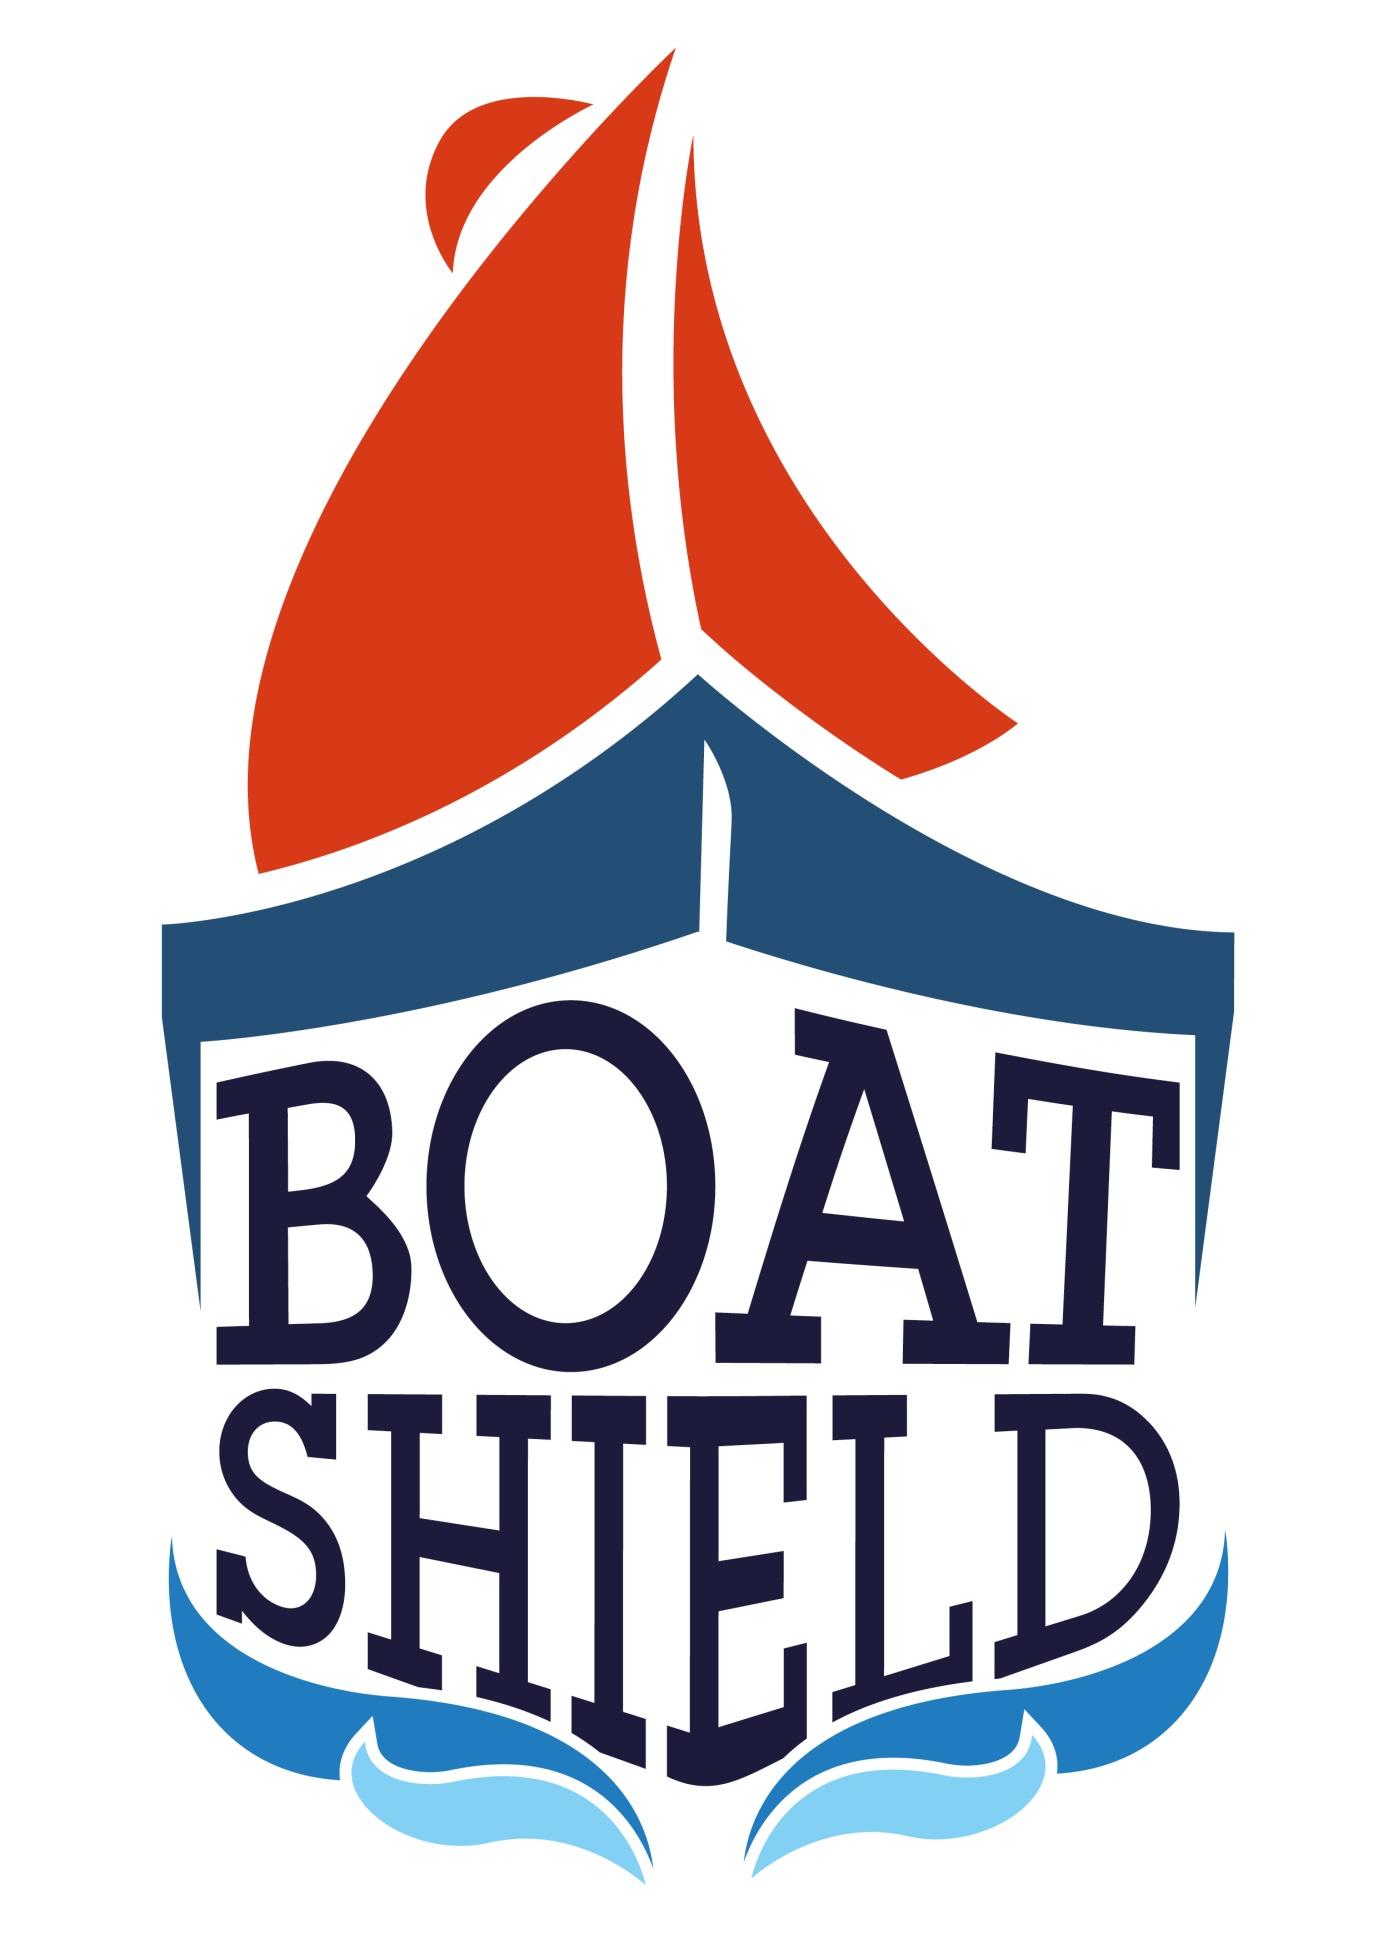 Boat Shield